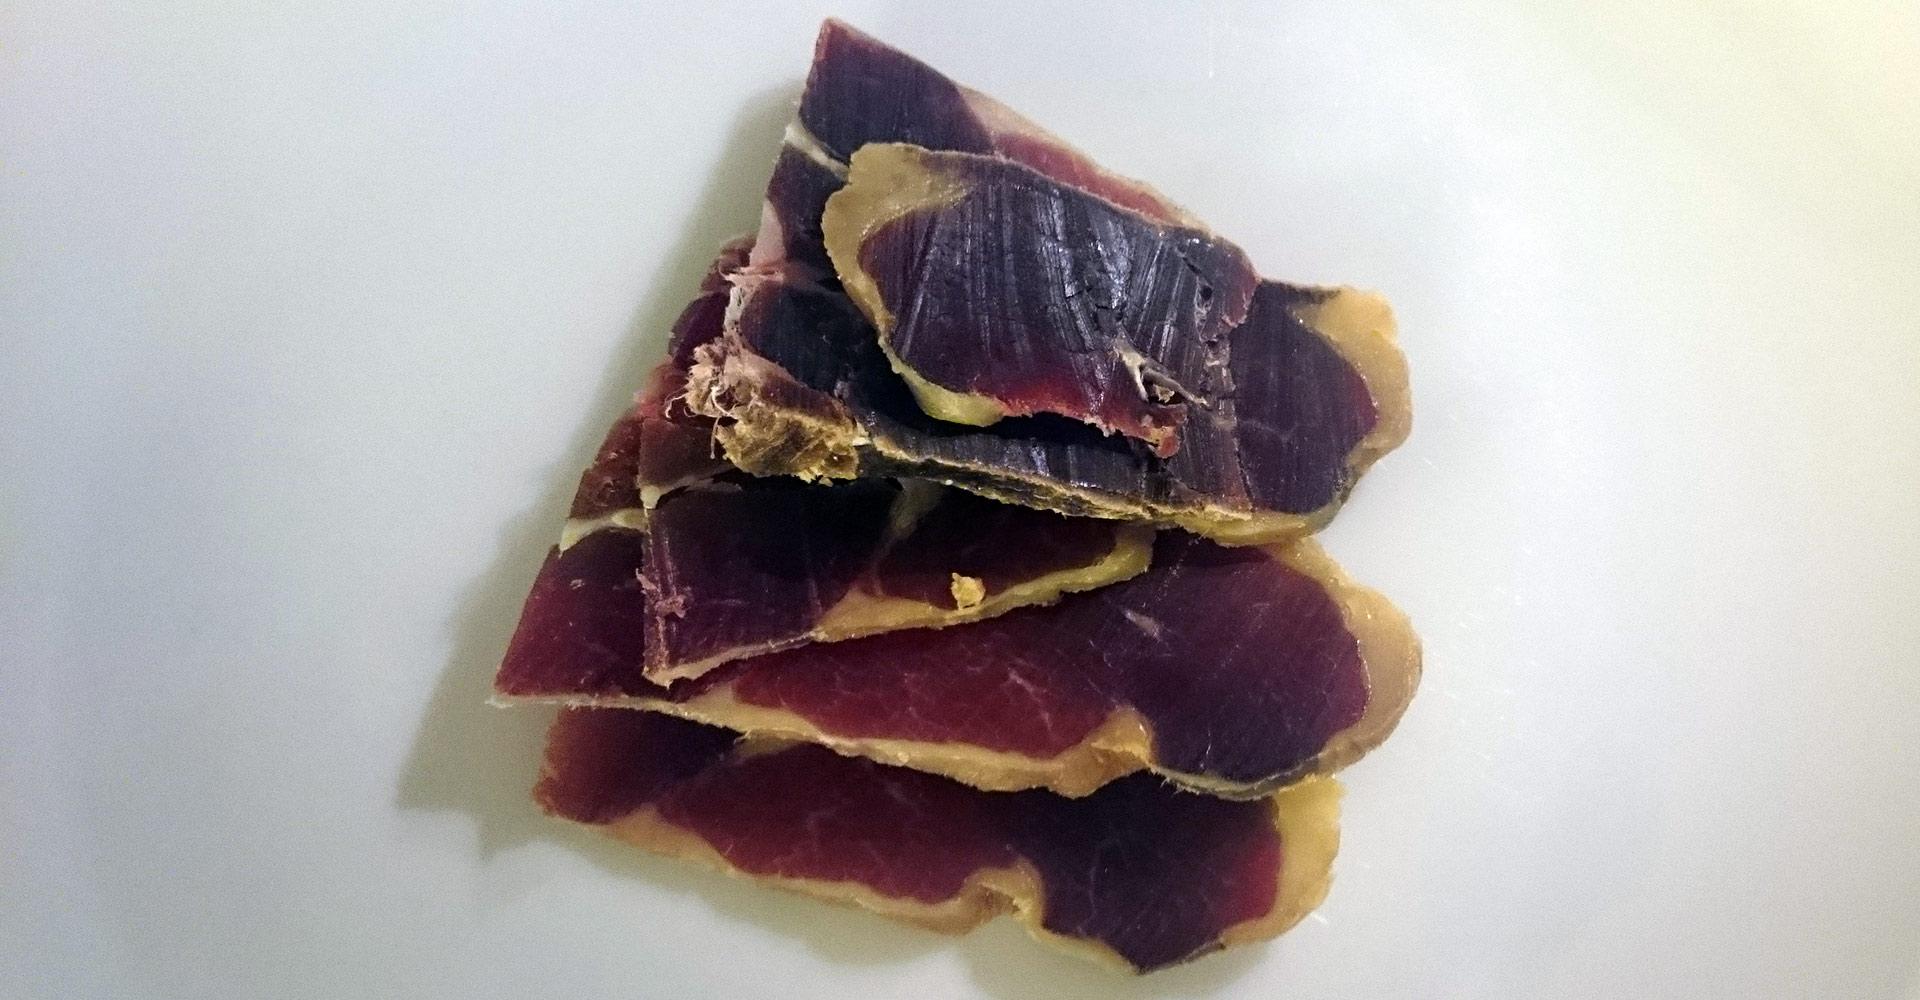 four slices of cured leg of lamb called fenalar in norwegian